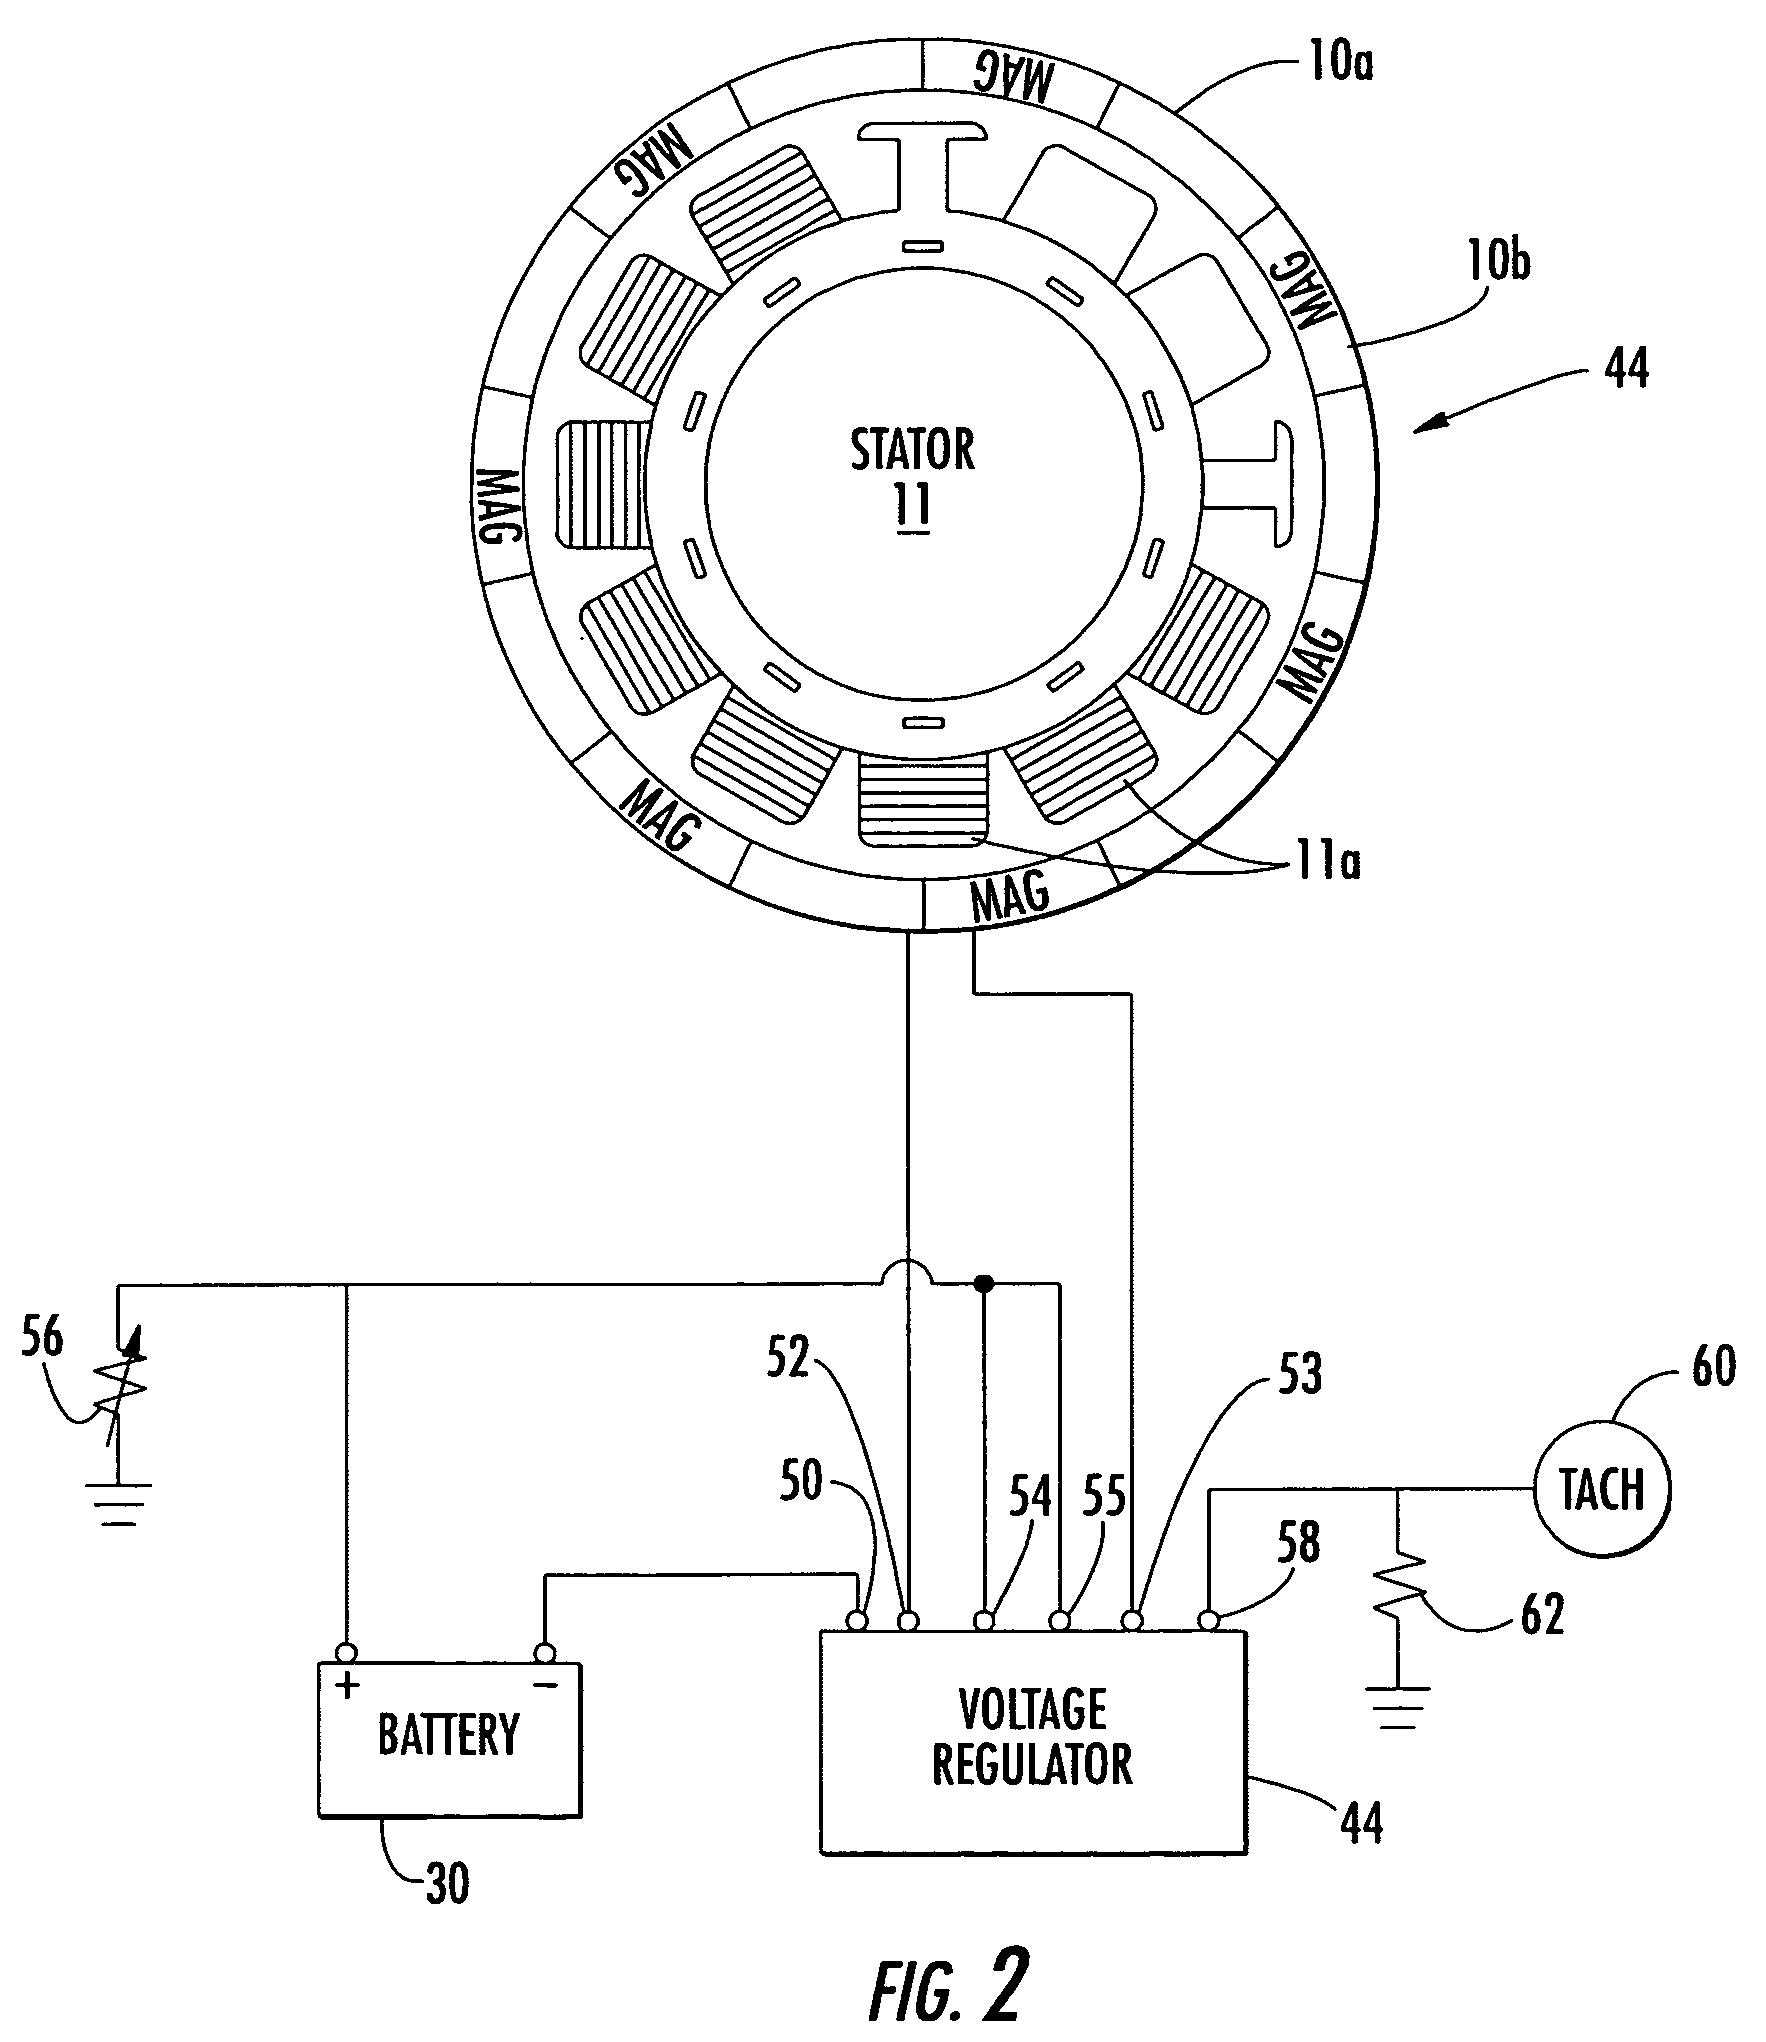 ducati voltage regulator schematic